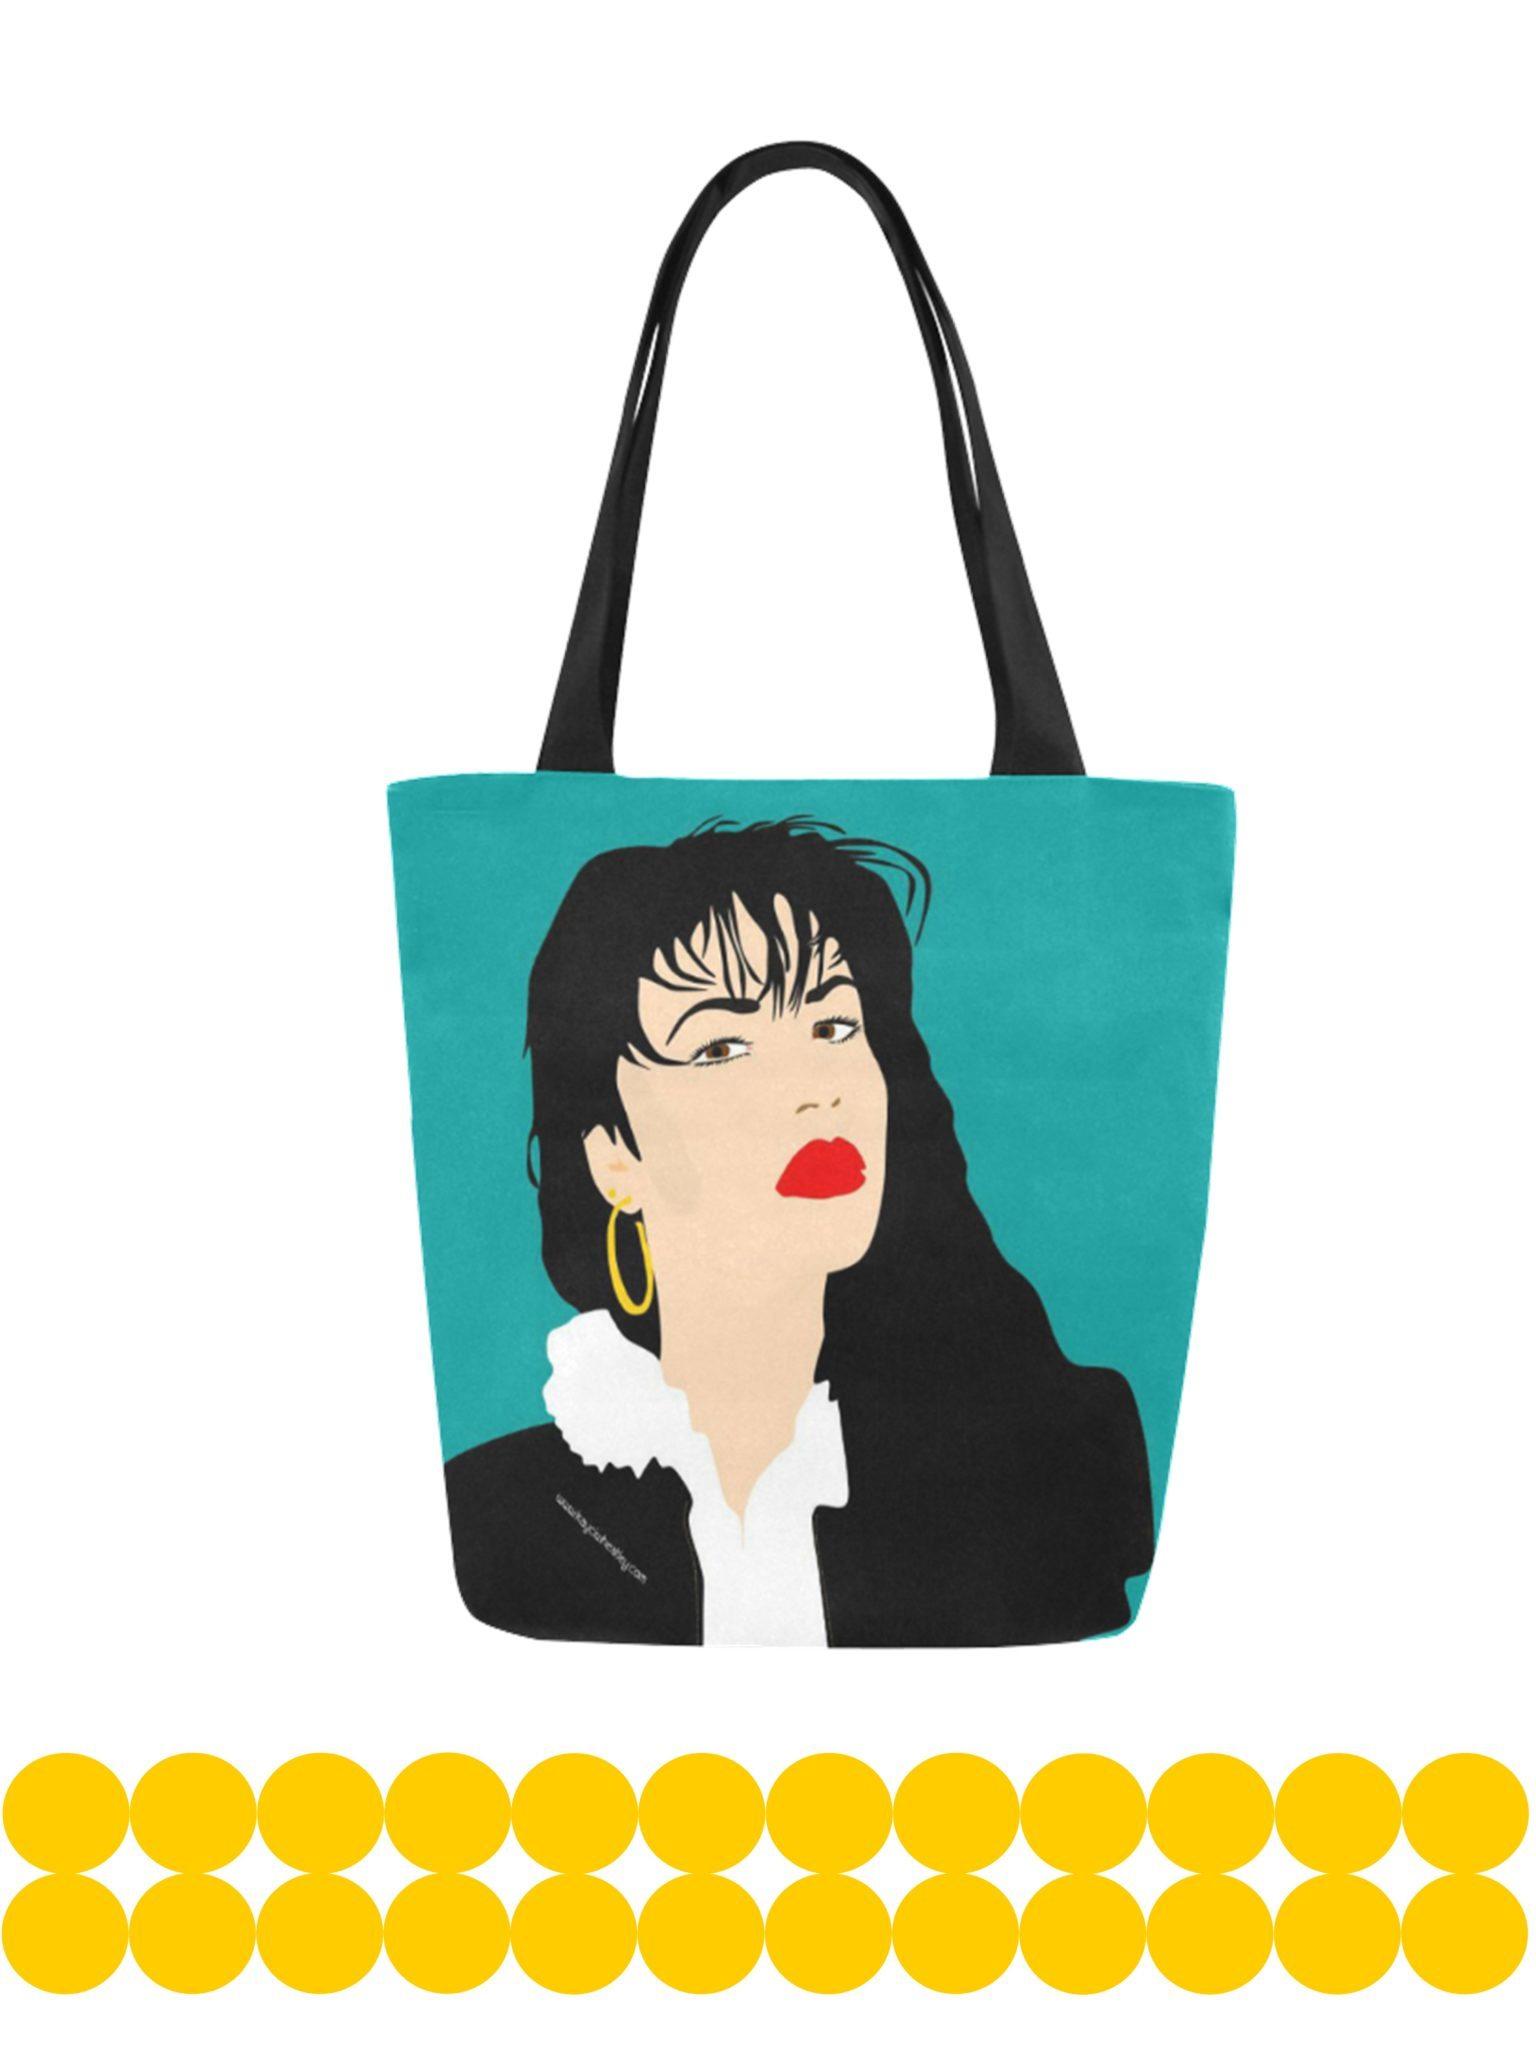 mexican madonna tote bag original illustration kayci garline wheatley. Black Bedroom Furniture Sets. Home Design Ideas